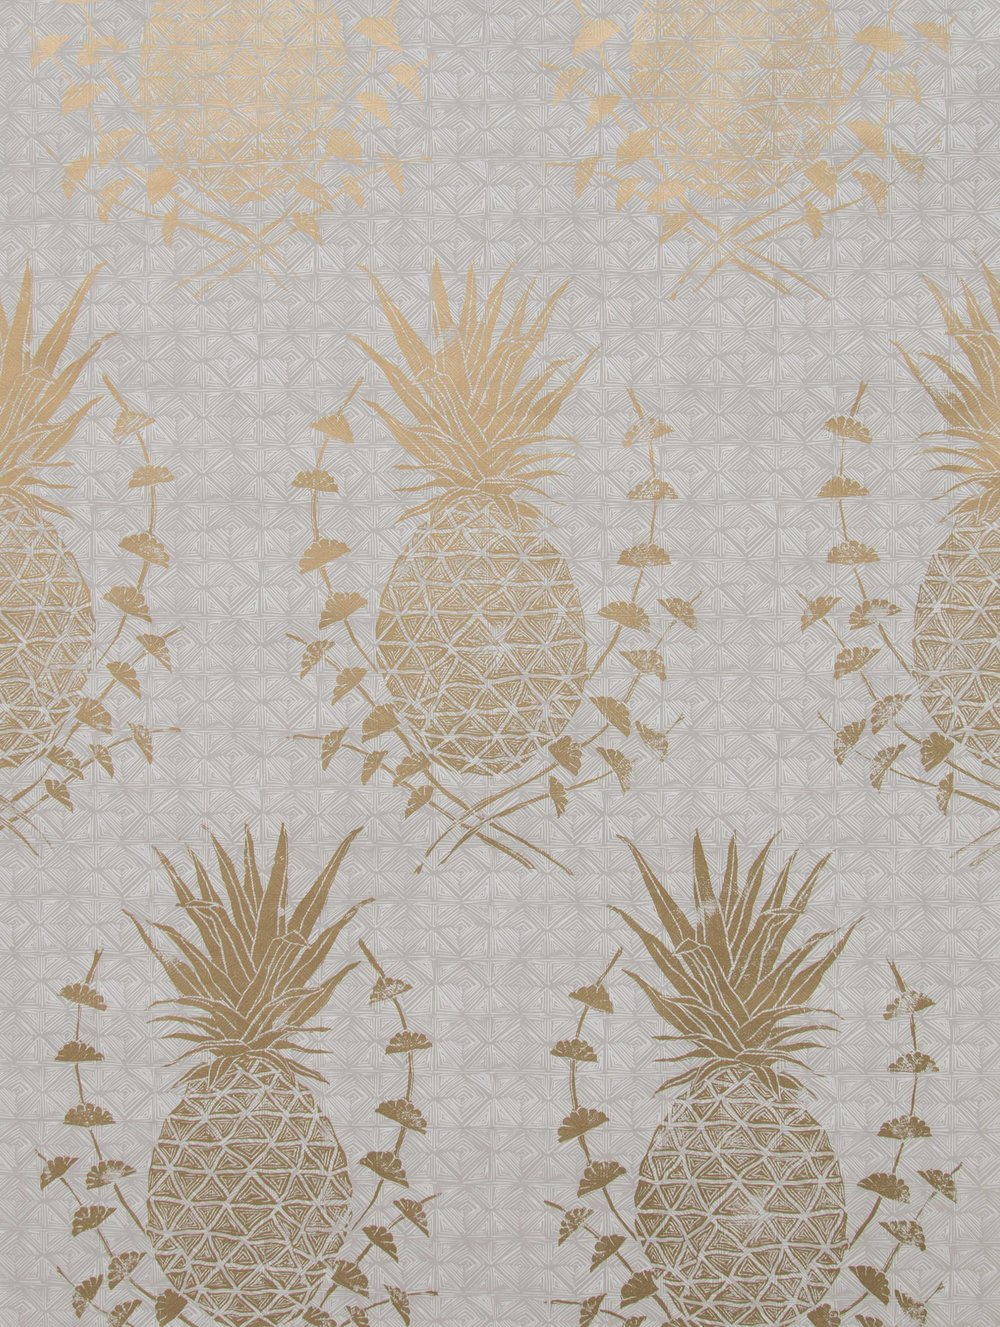 Krane Home_Royal Pineapple Gold Wallpaper-1.jpeg